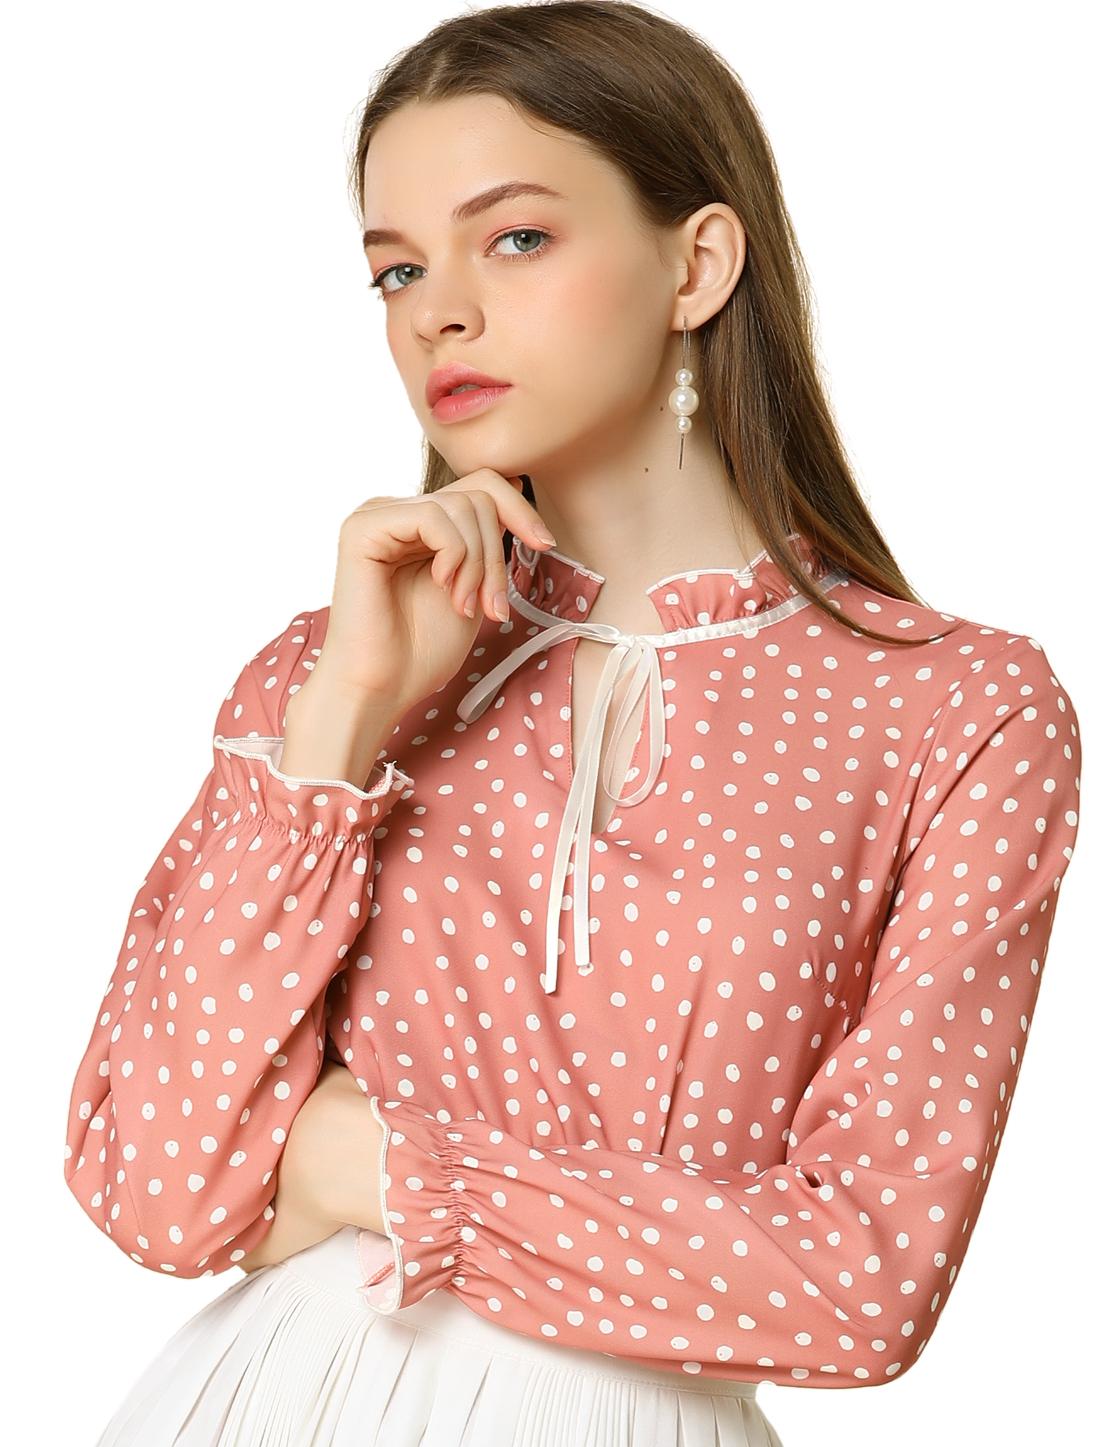 Allegra K Women's Tie Ruffled Neck Polka Dots Blouse Bell Sleeves Tops Pink XL